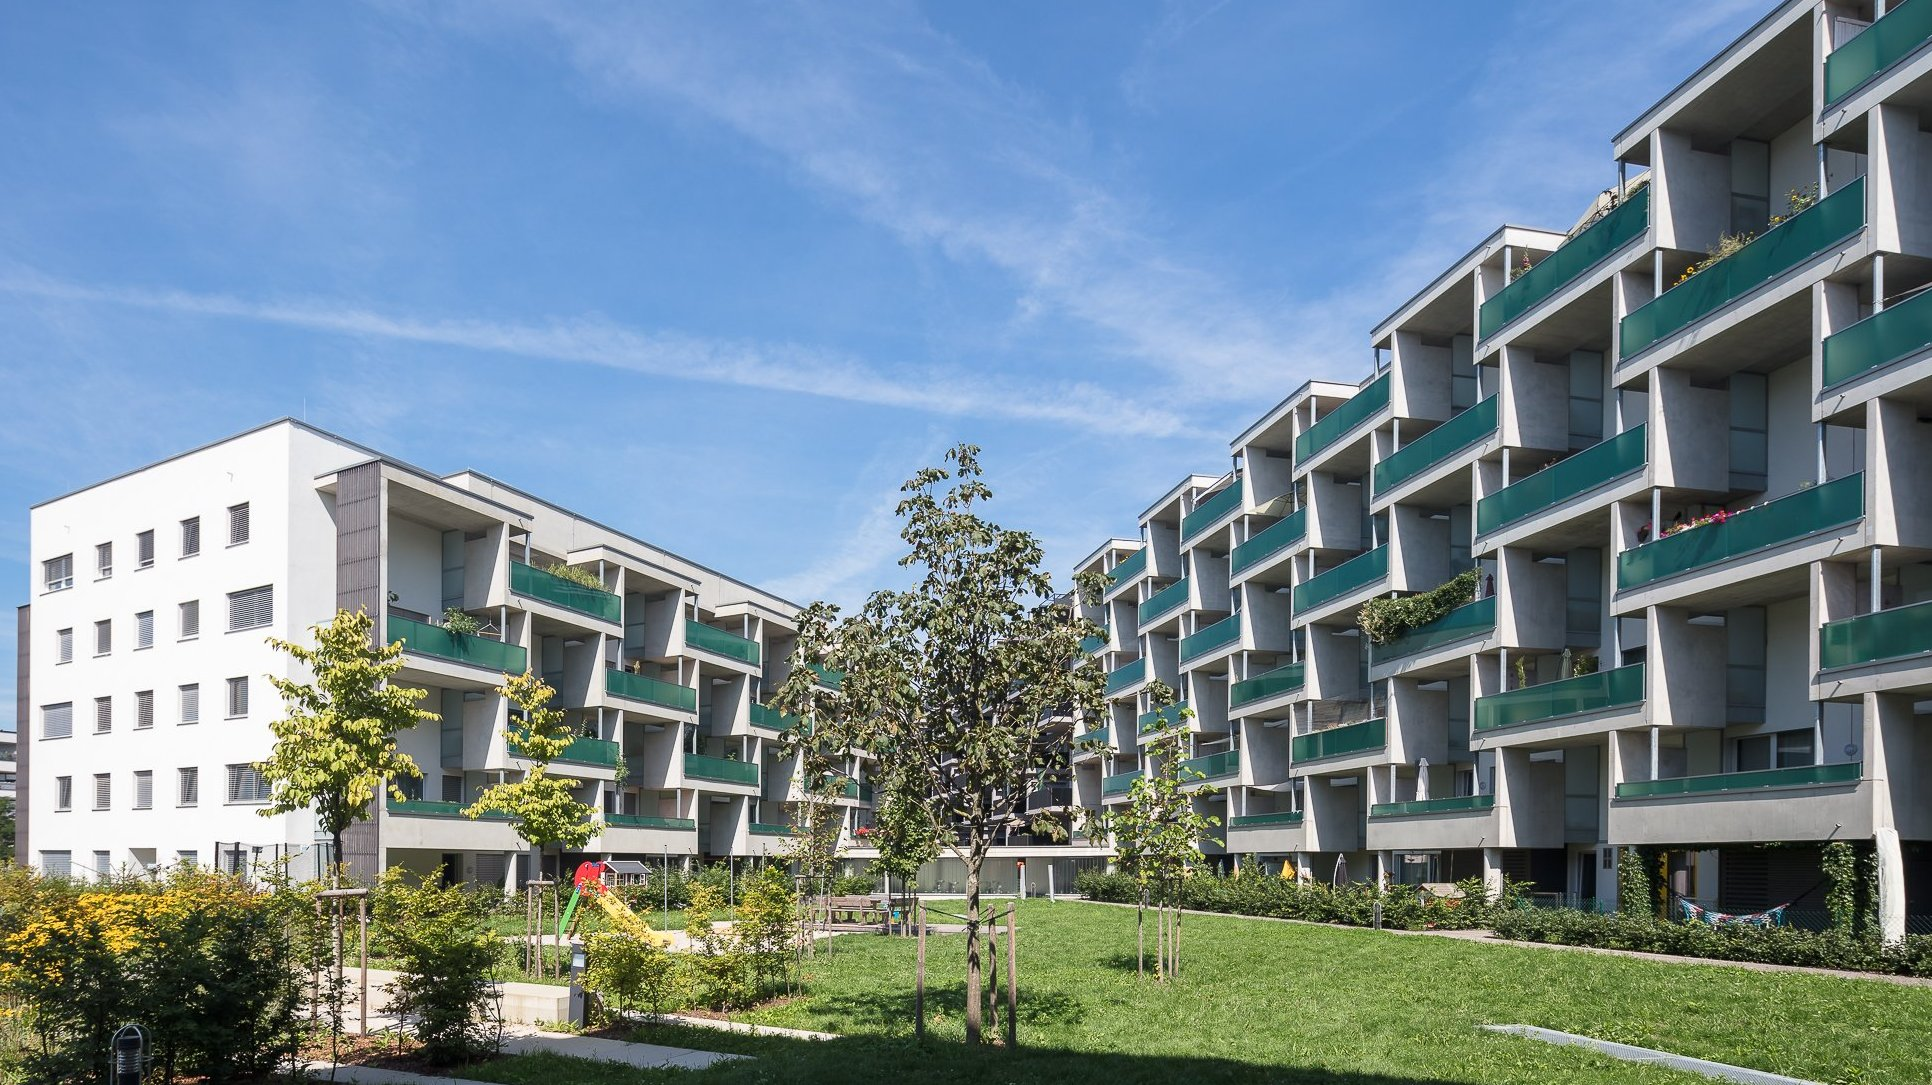 Linz Grüne Mitte, Donau Park